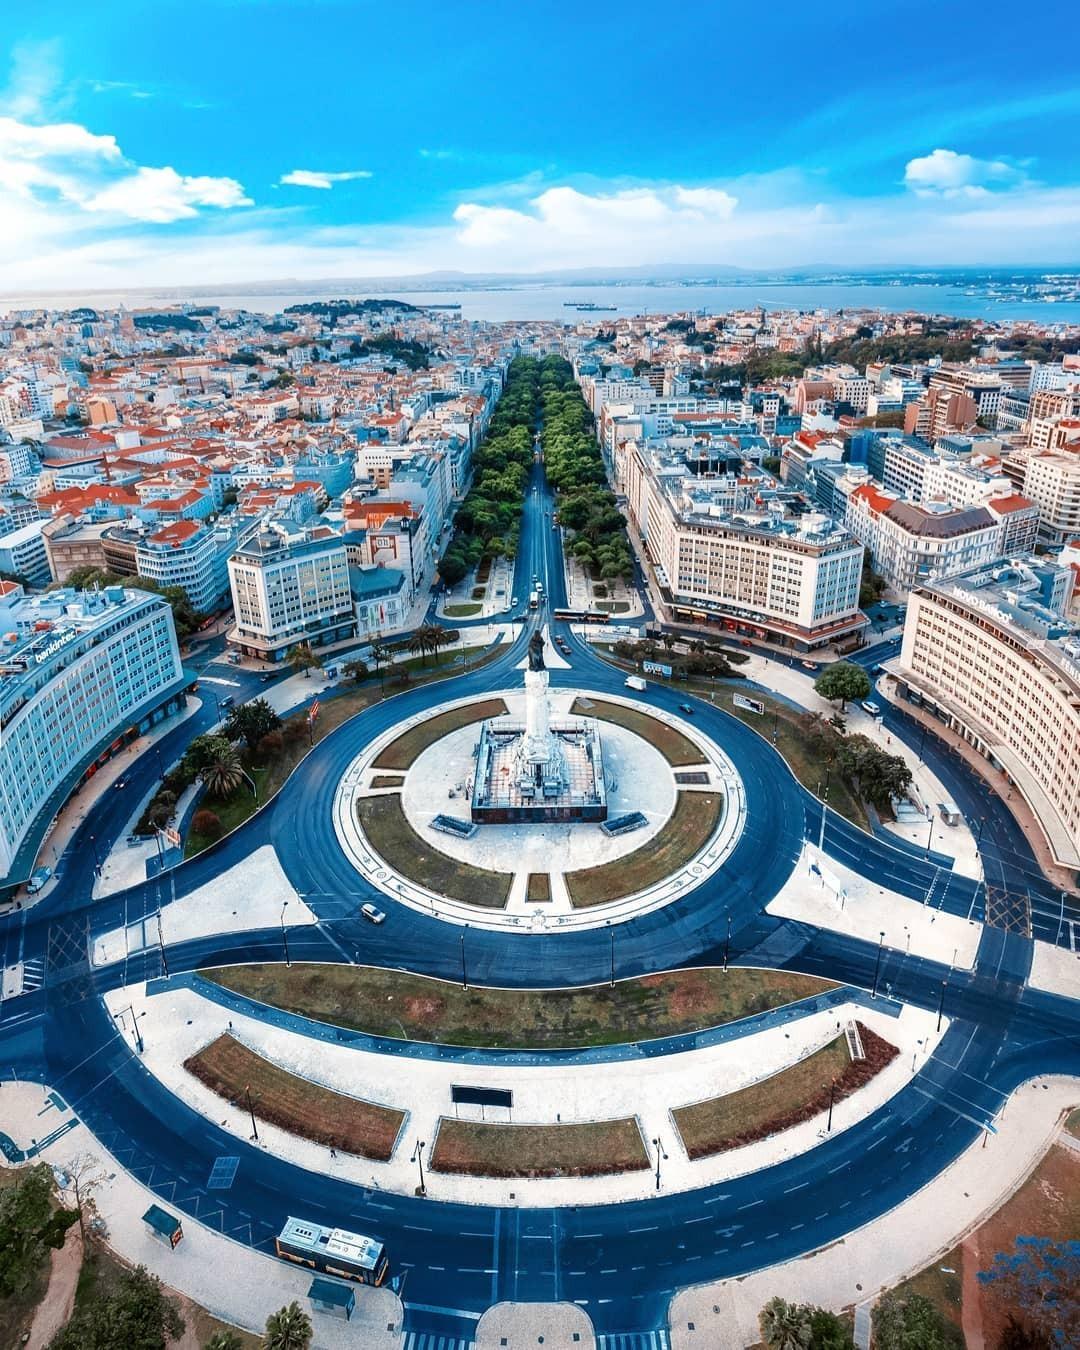 30 fotos de Lisboa vista de cima